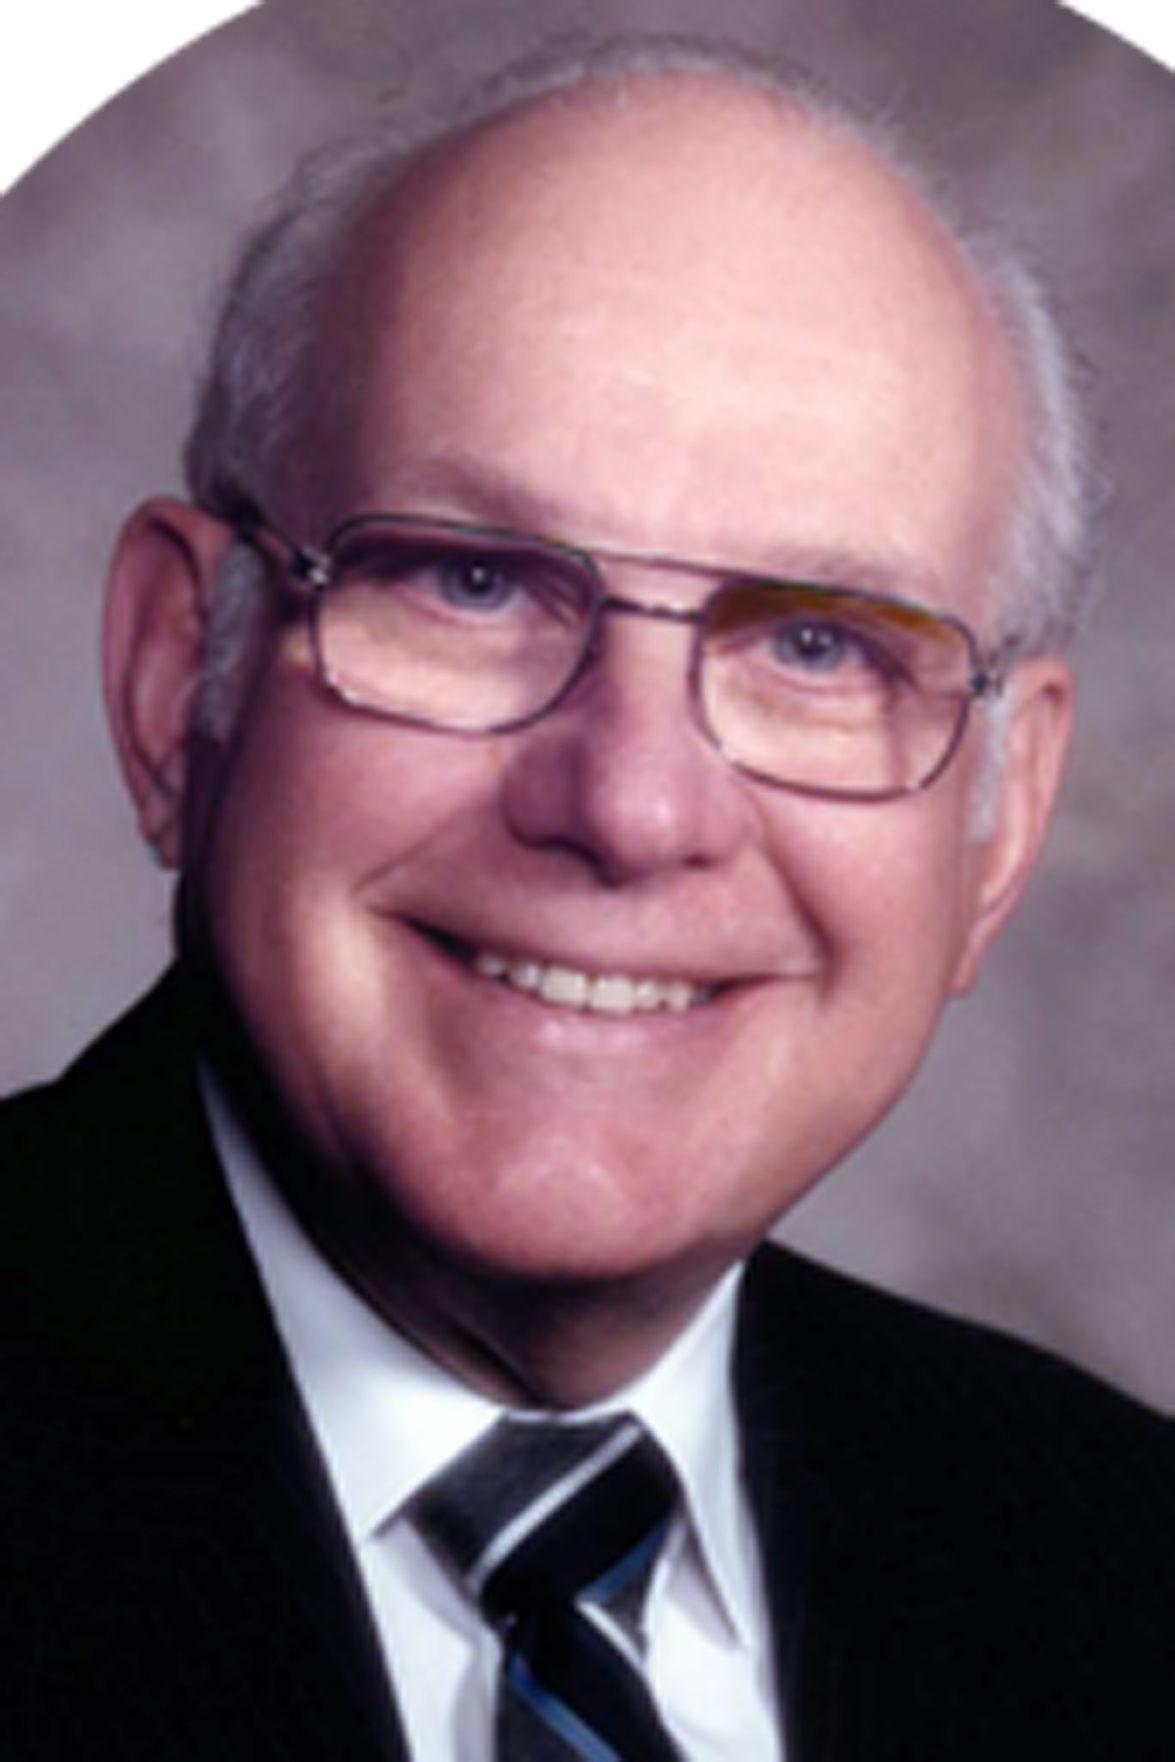 Donald E. Schaufelberger